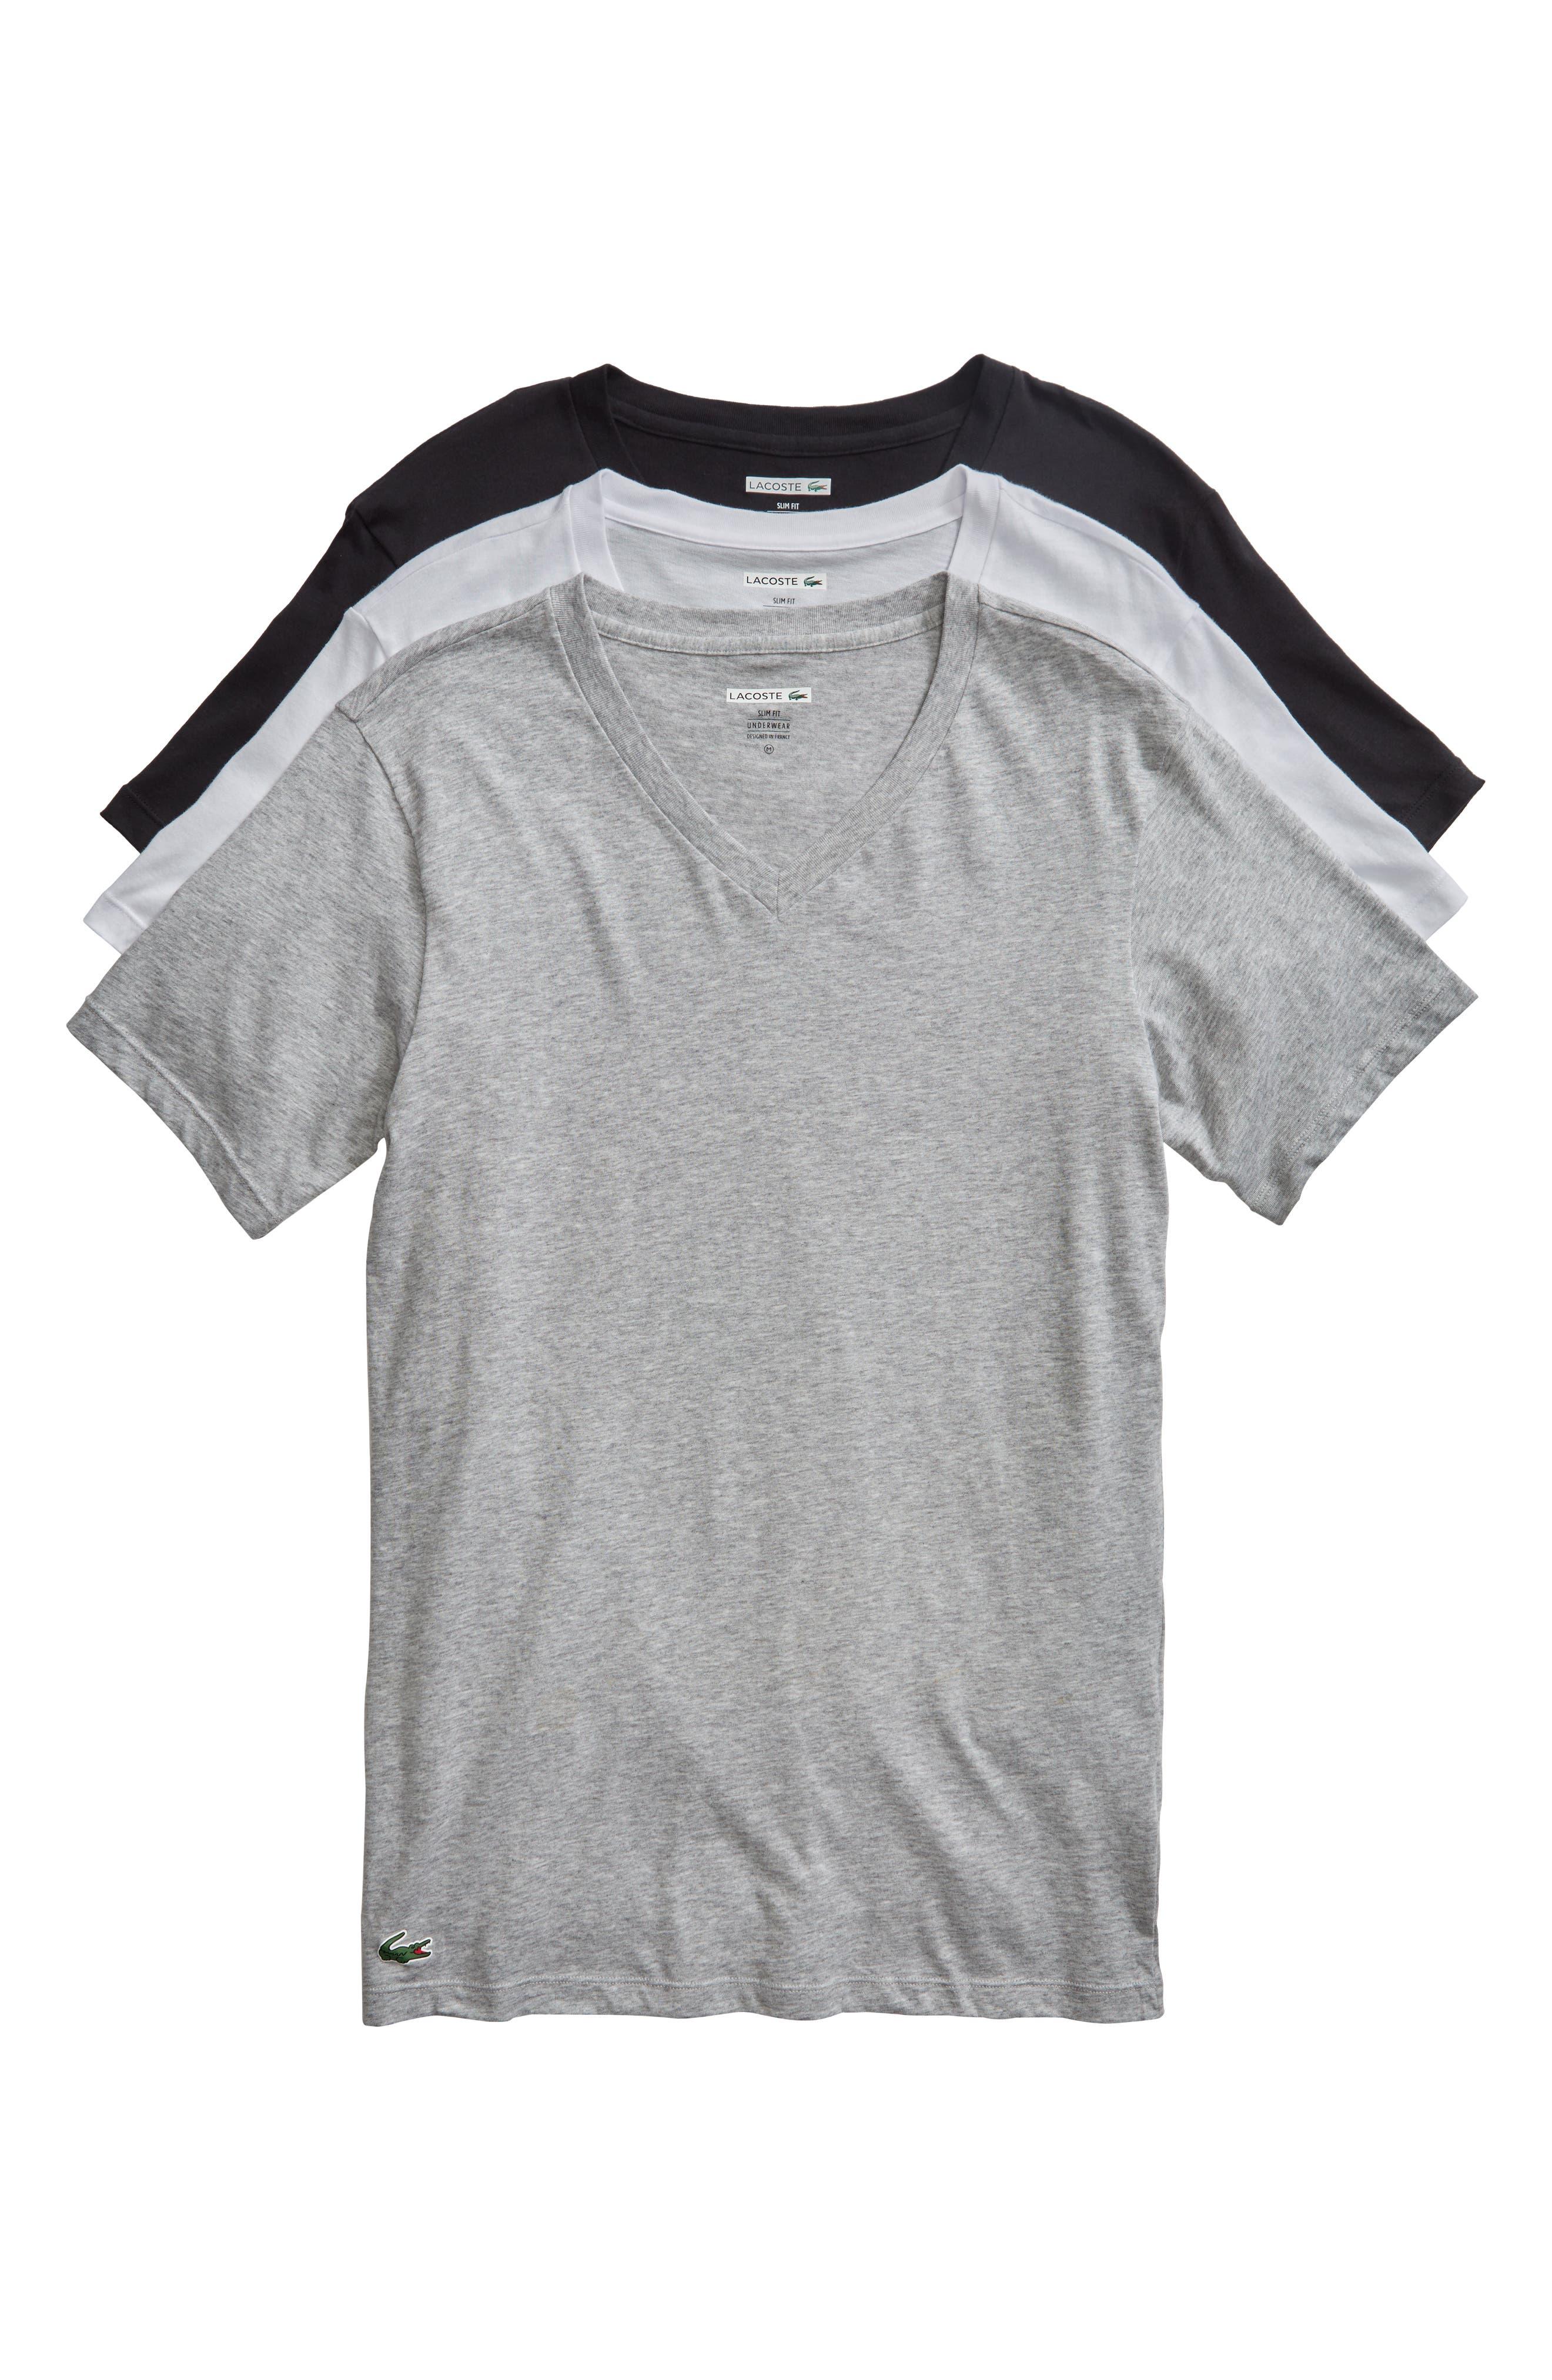 LACOSTE,                             3-Pack Slim Fit V-Neck T-Shirts,                             Alternate thumbnail 6, color,                             BLACK/ GREY/ WHITE